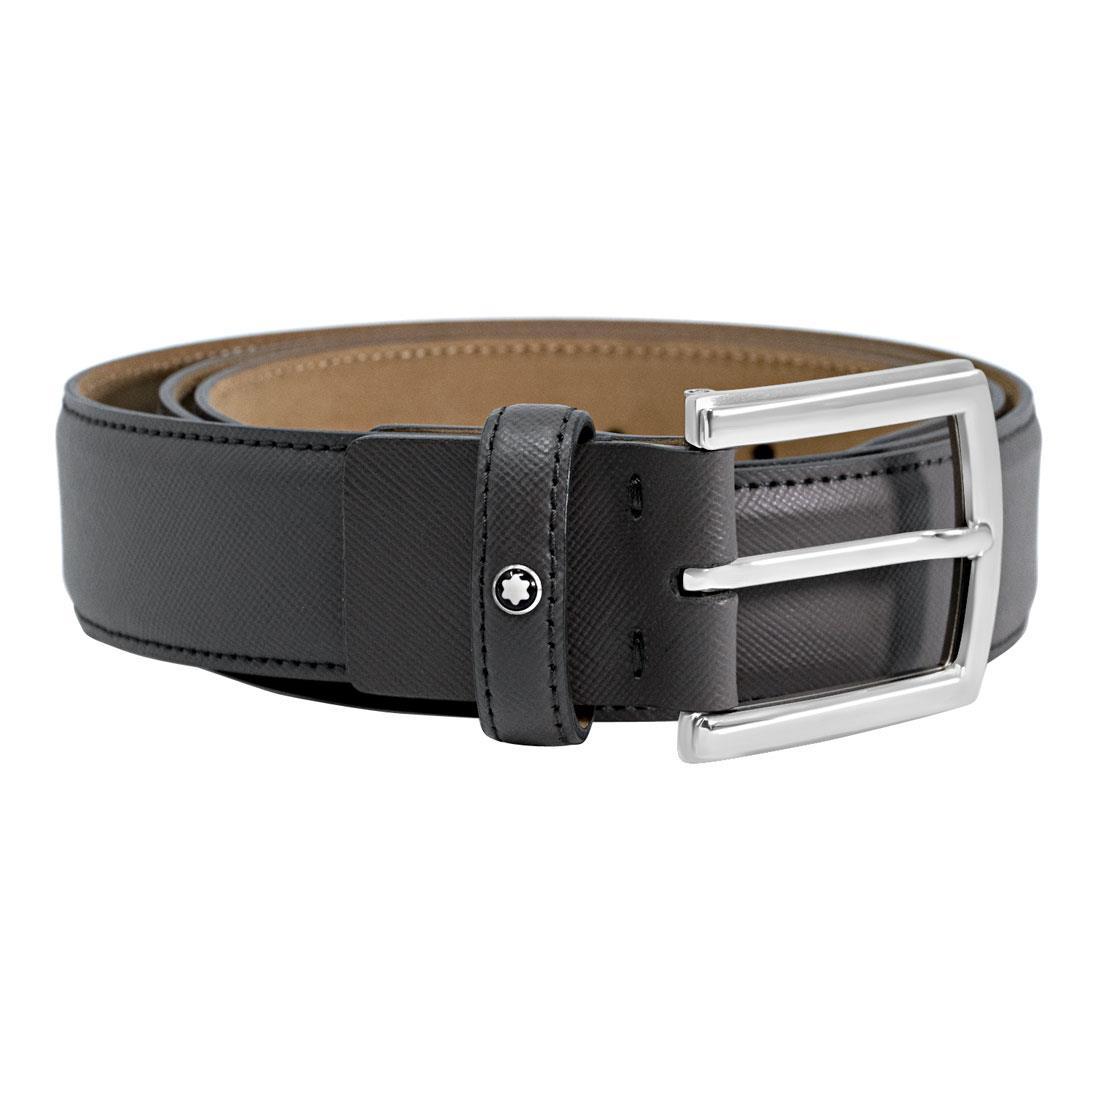 Cintura in pelle marrone  - MONTBLANC